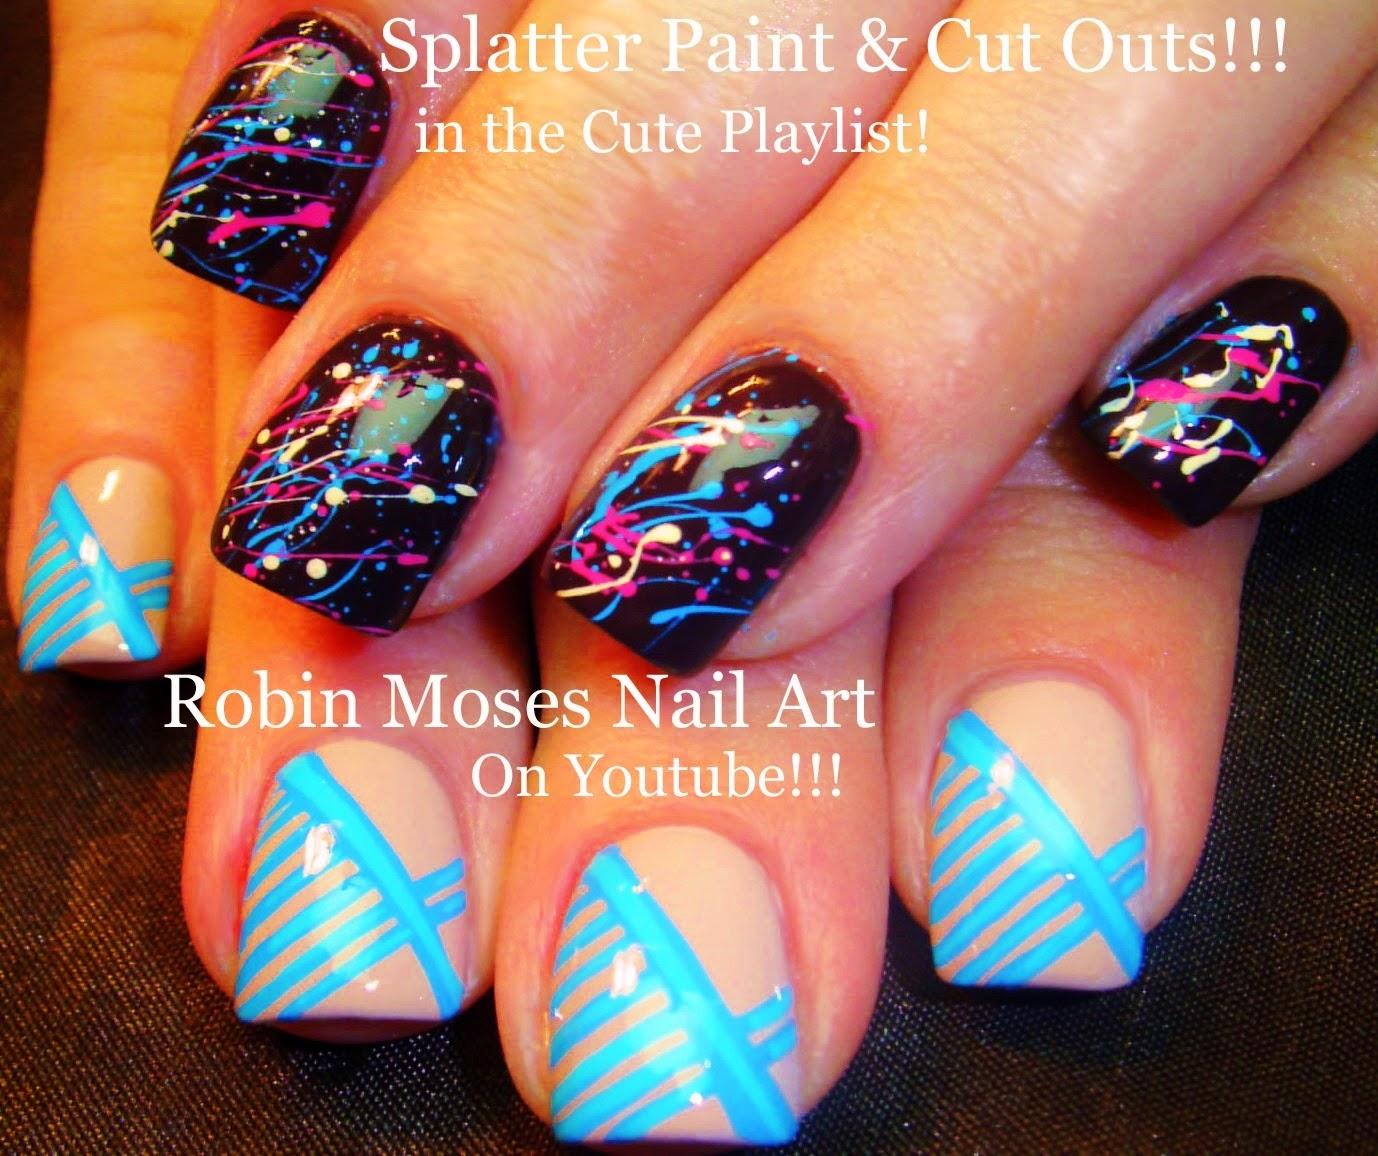 Robin Moses Nail Art: Splatter Paint Nail Art Technique ...